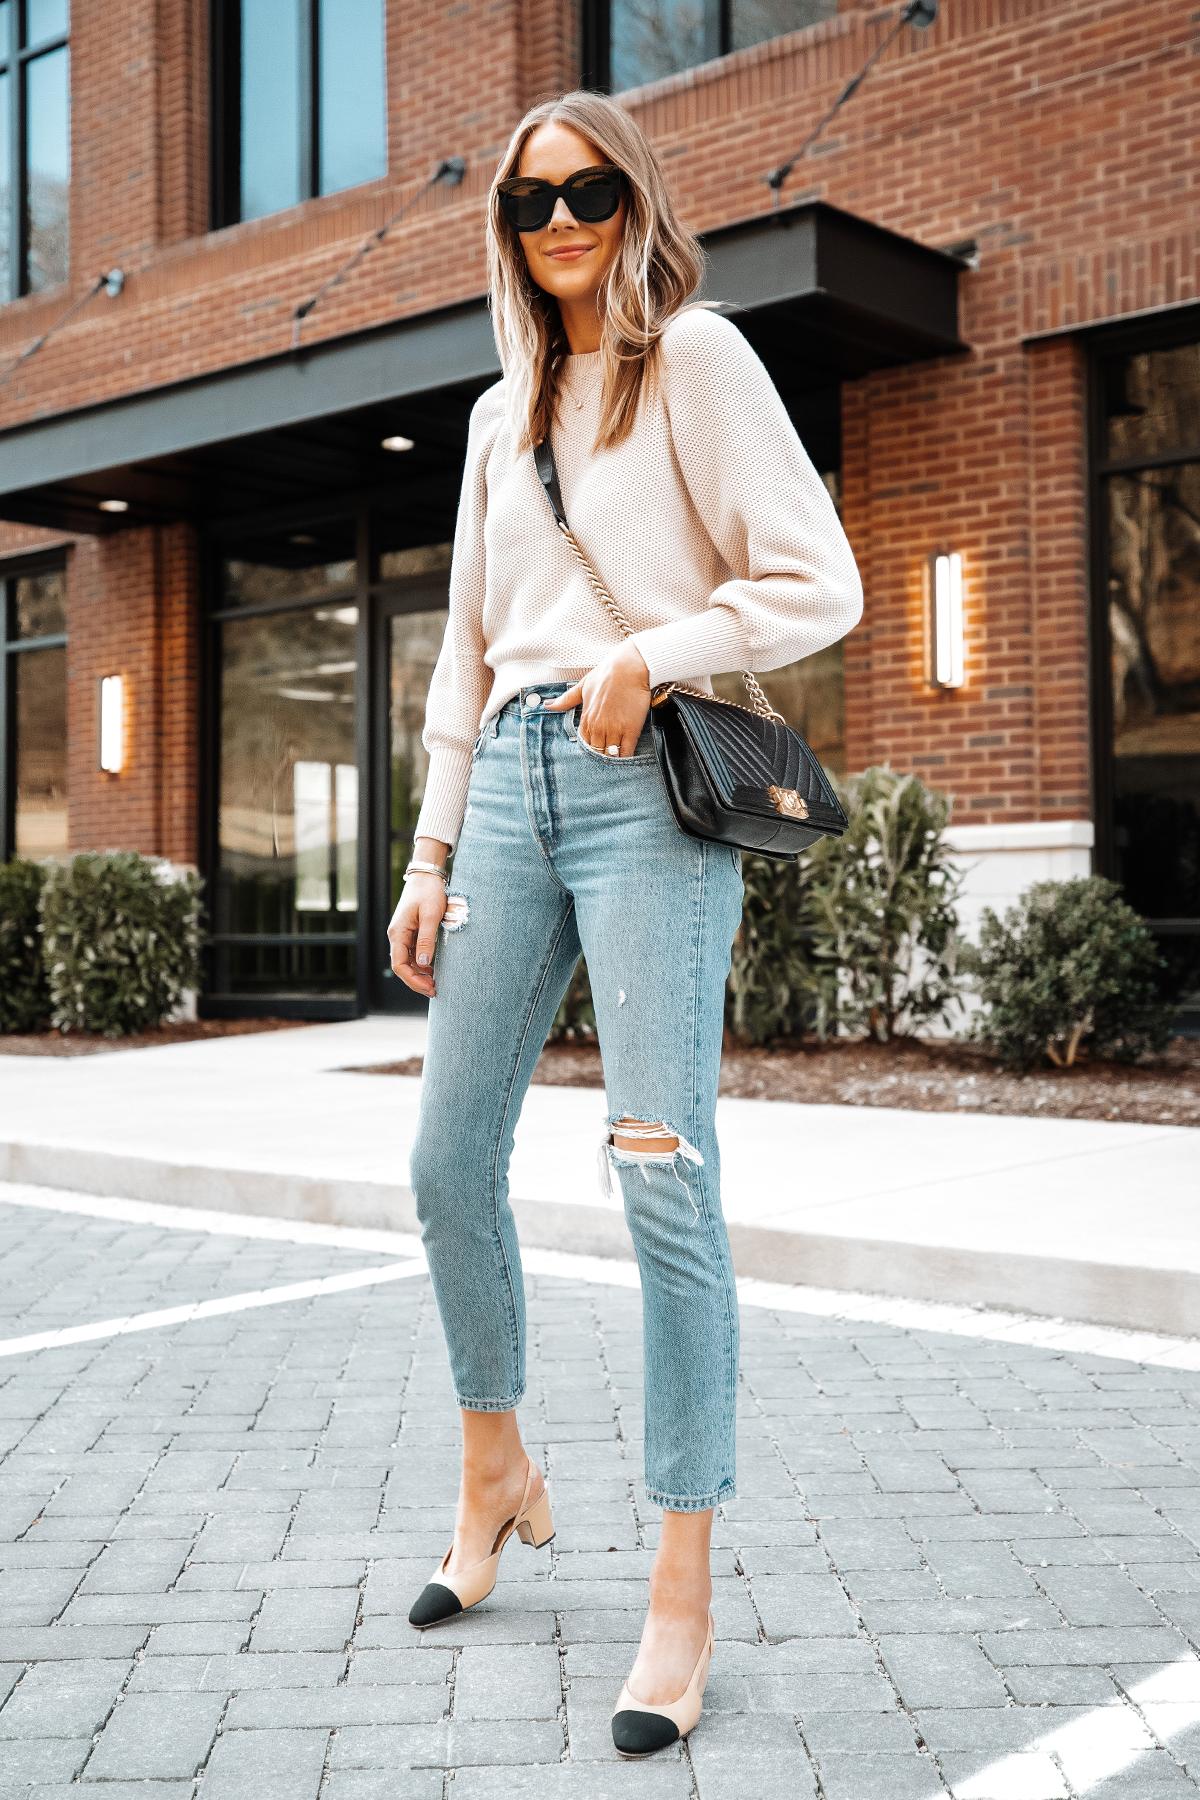 Fashion Jackson Wearing Ann Taylor Beige Knit Sweater Levis Ripped Jeans Chanel Slingbacks Chanel Boy Bag